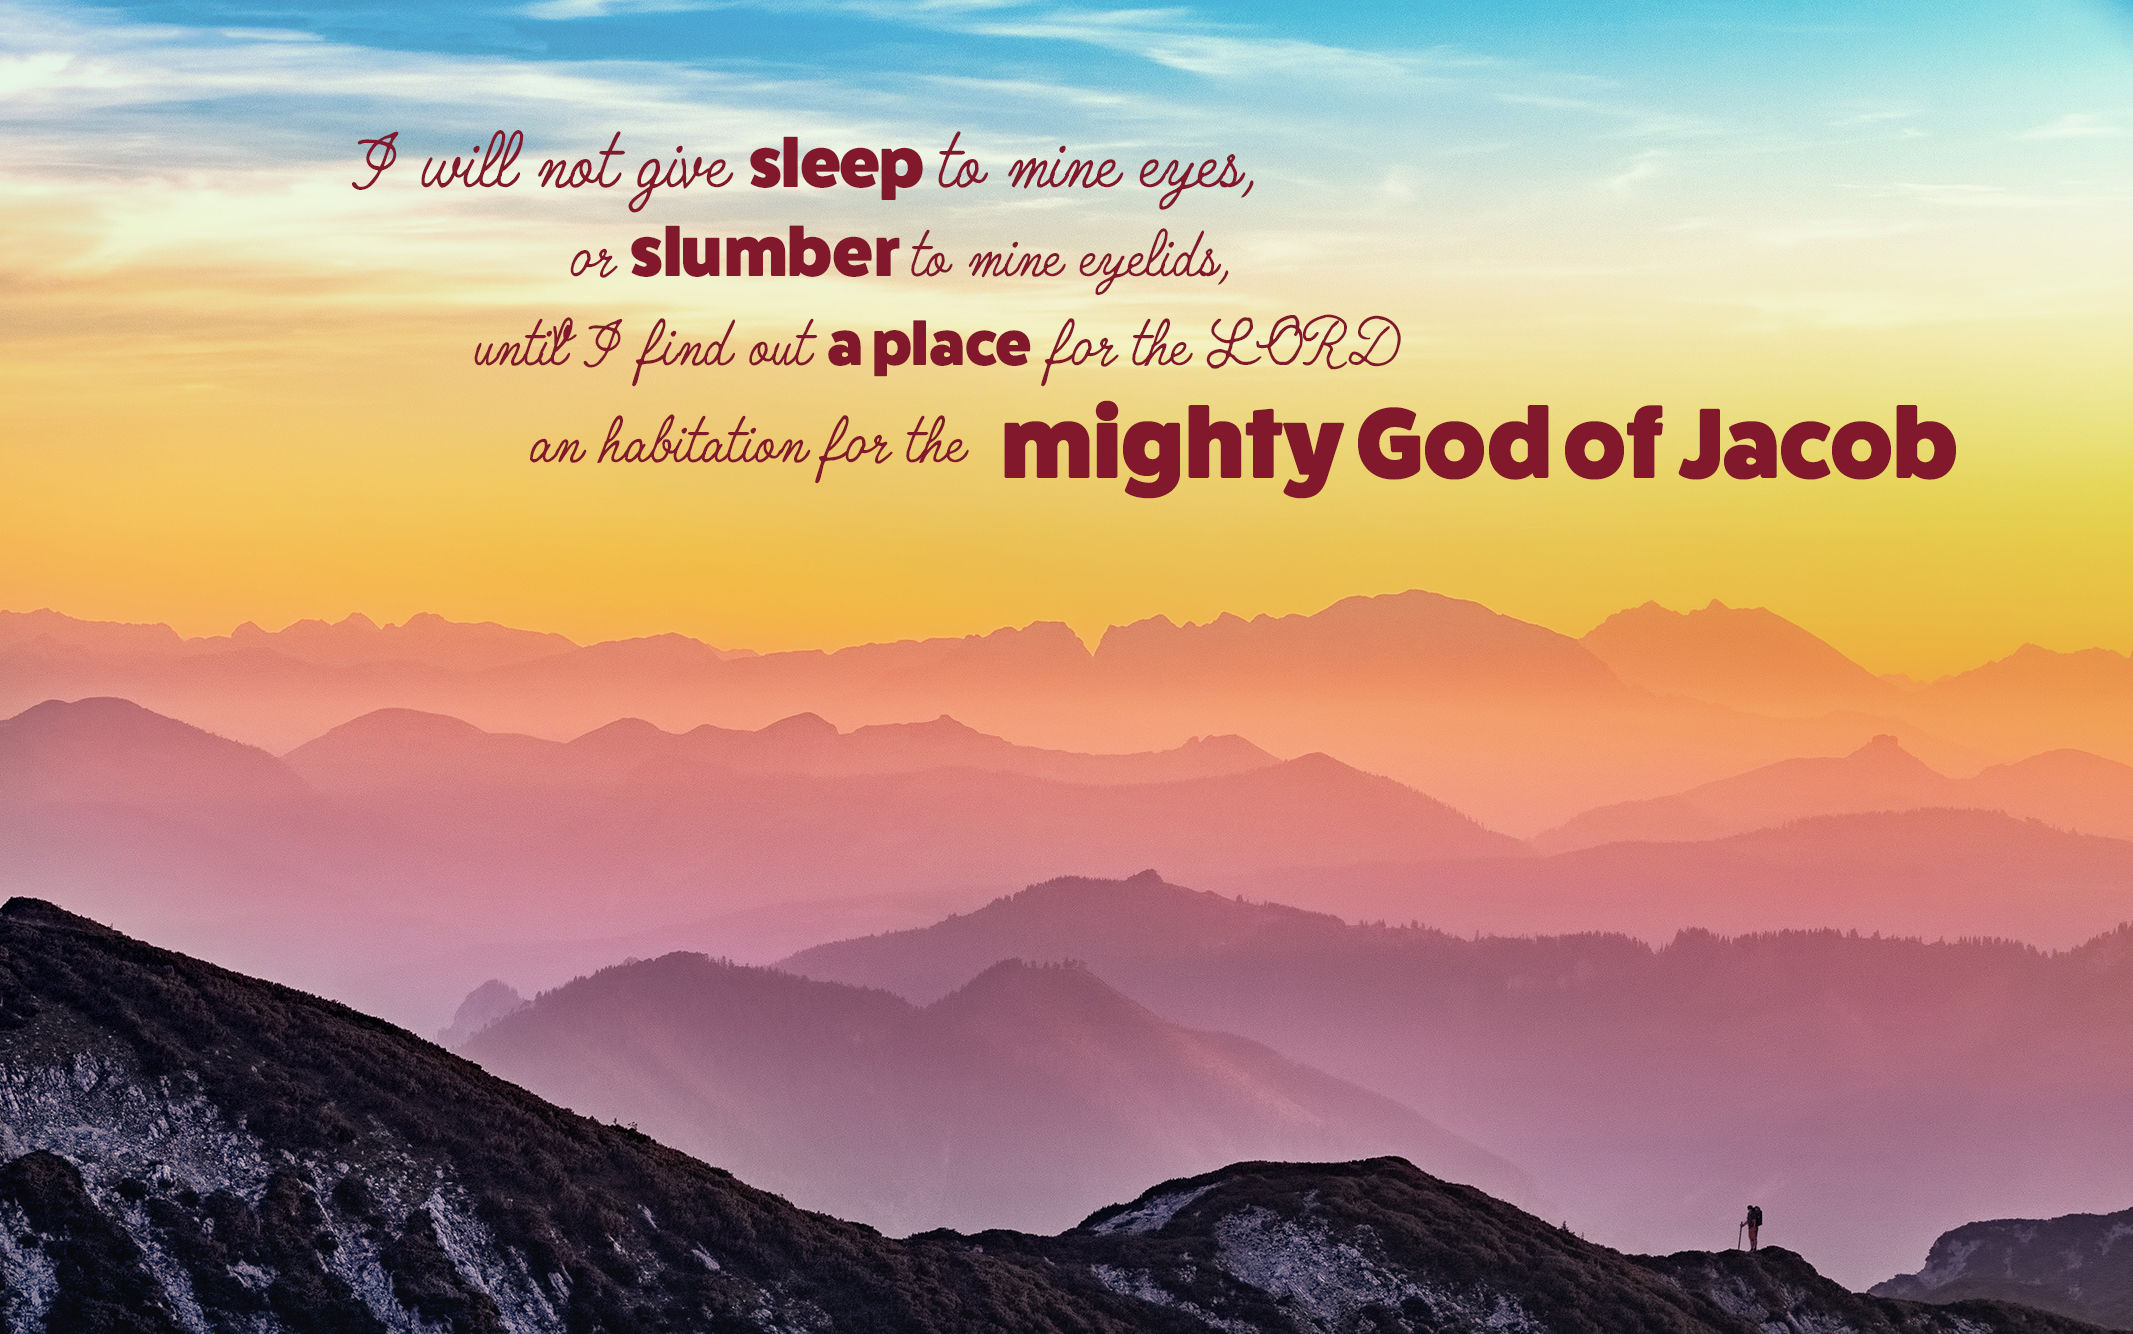 Beautiful Wallpaper Mac Bible Verse - Psalms-132-4  Collection_244862.jpg?id\u003dTm9ub3VKRDBJYm1UZ05jMzFpU3Jwdz09